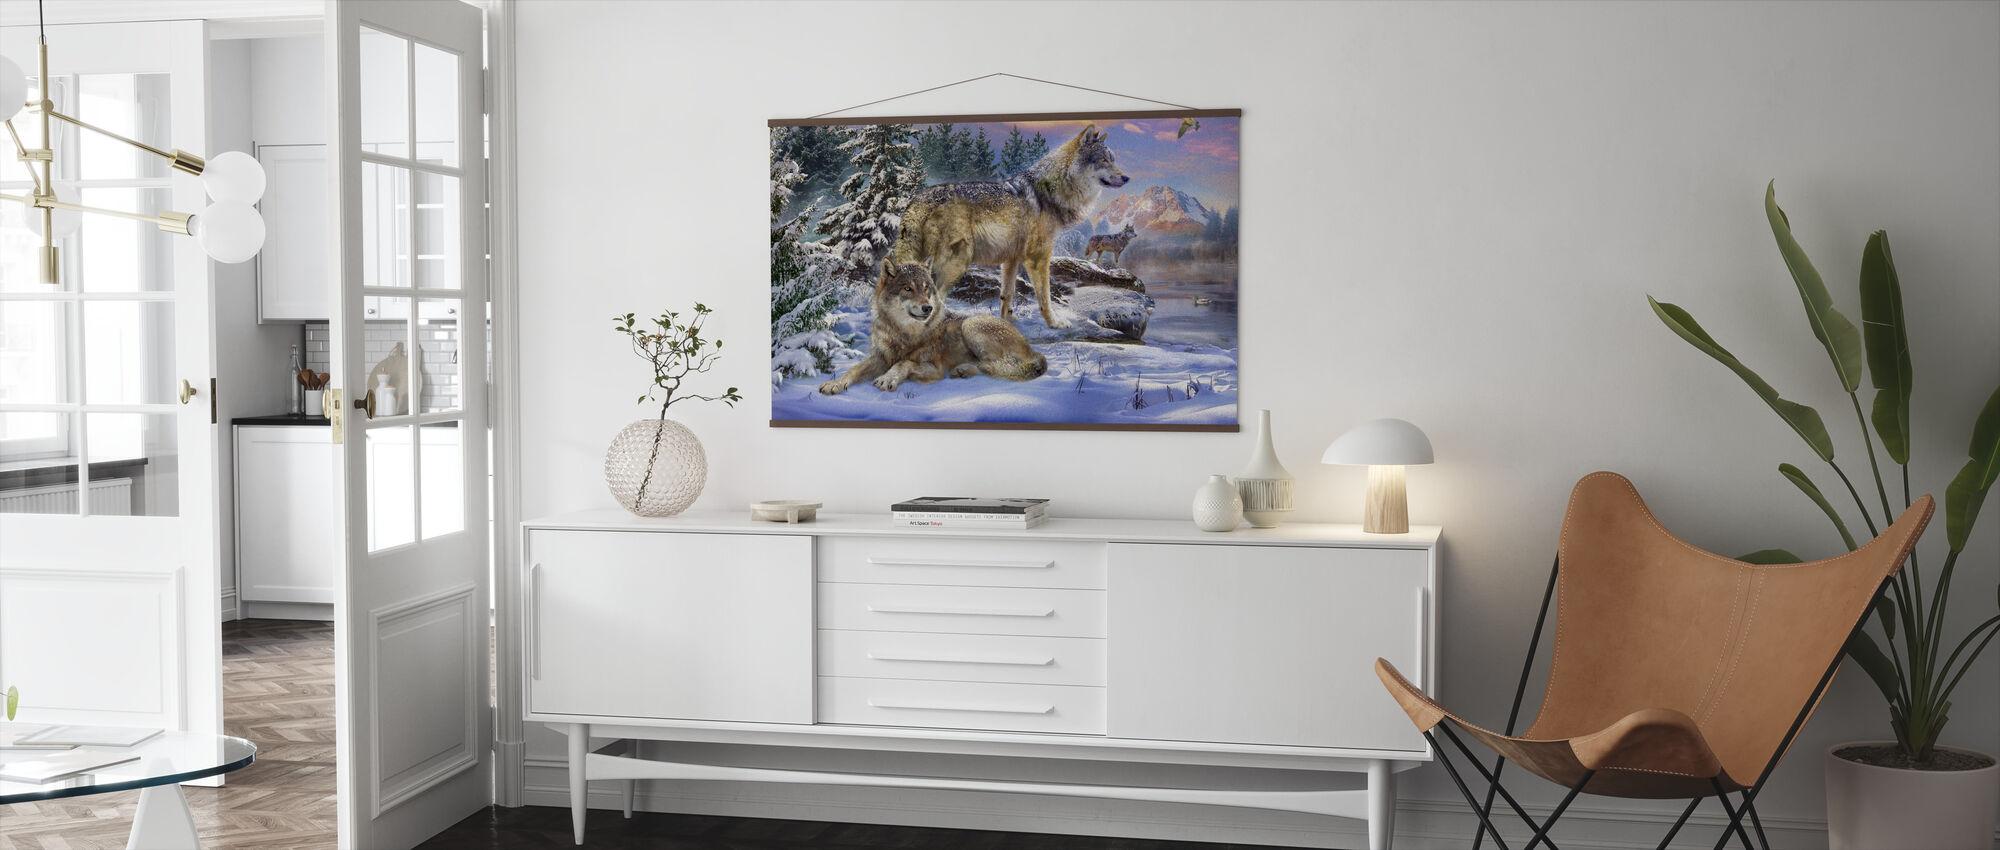 Wolves in Winter - Poster - Living Room